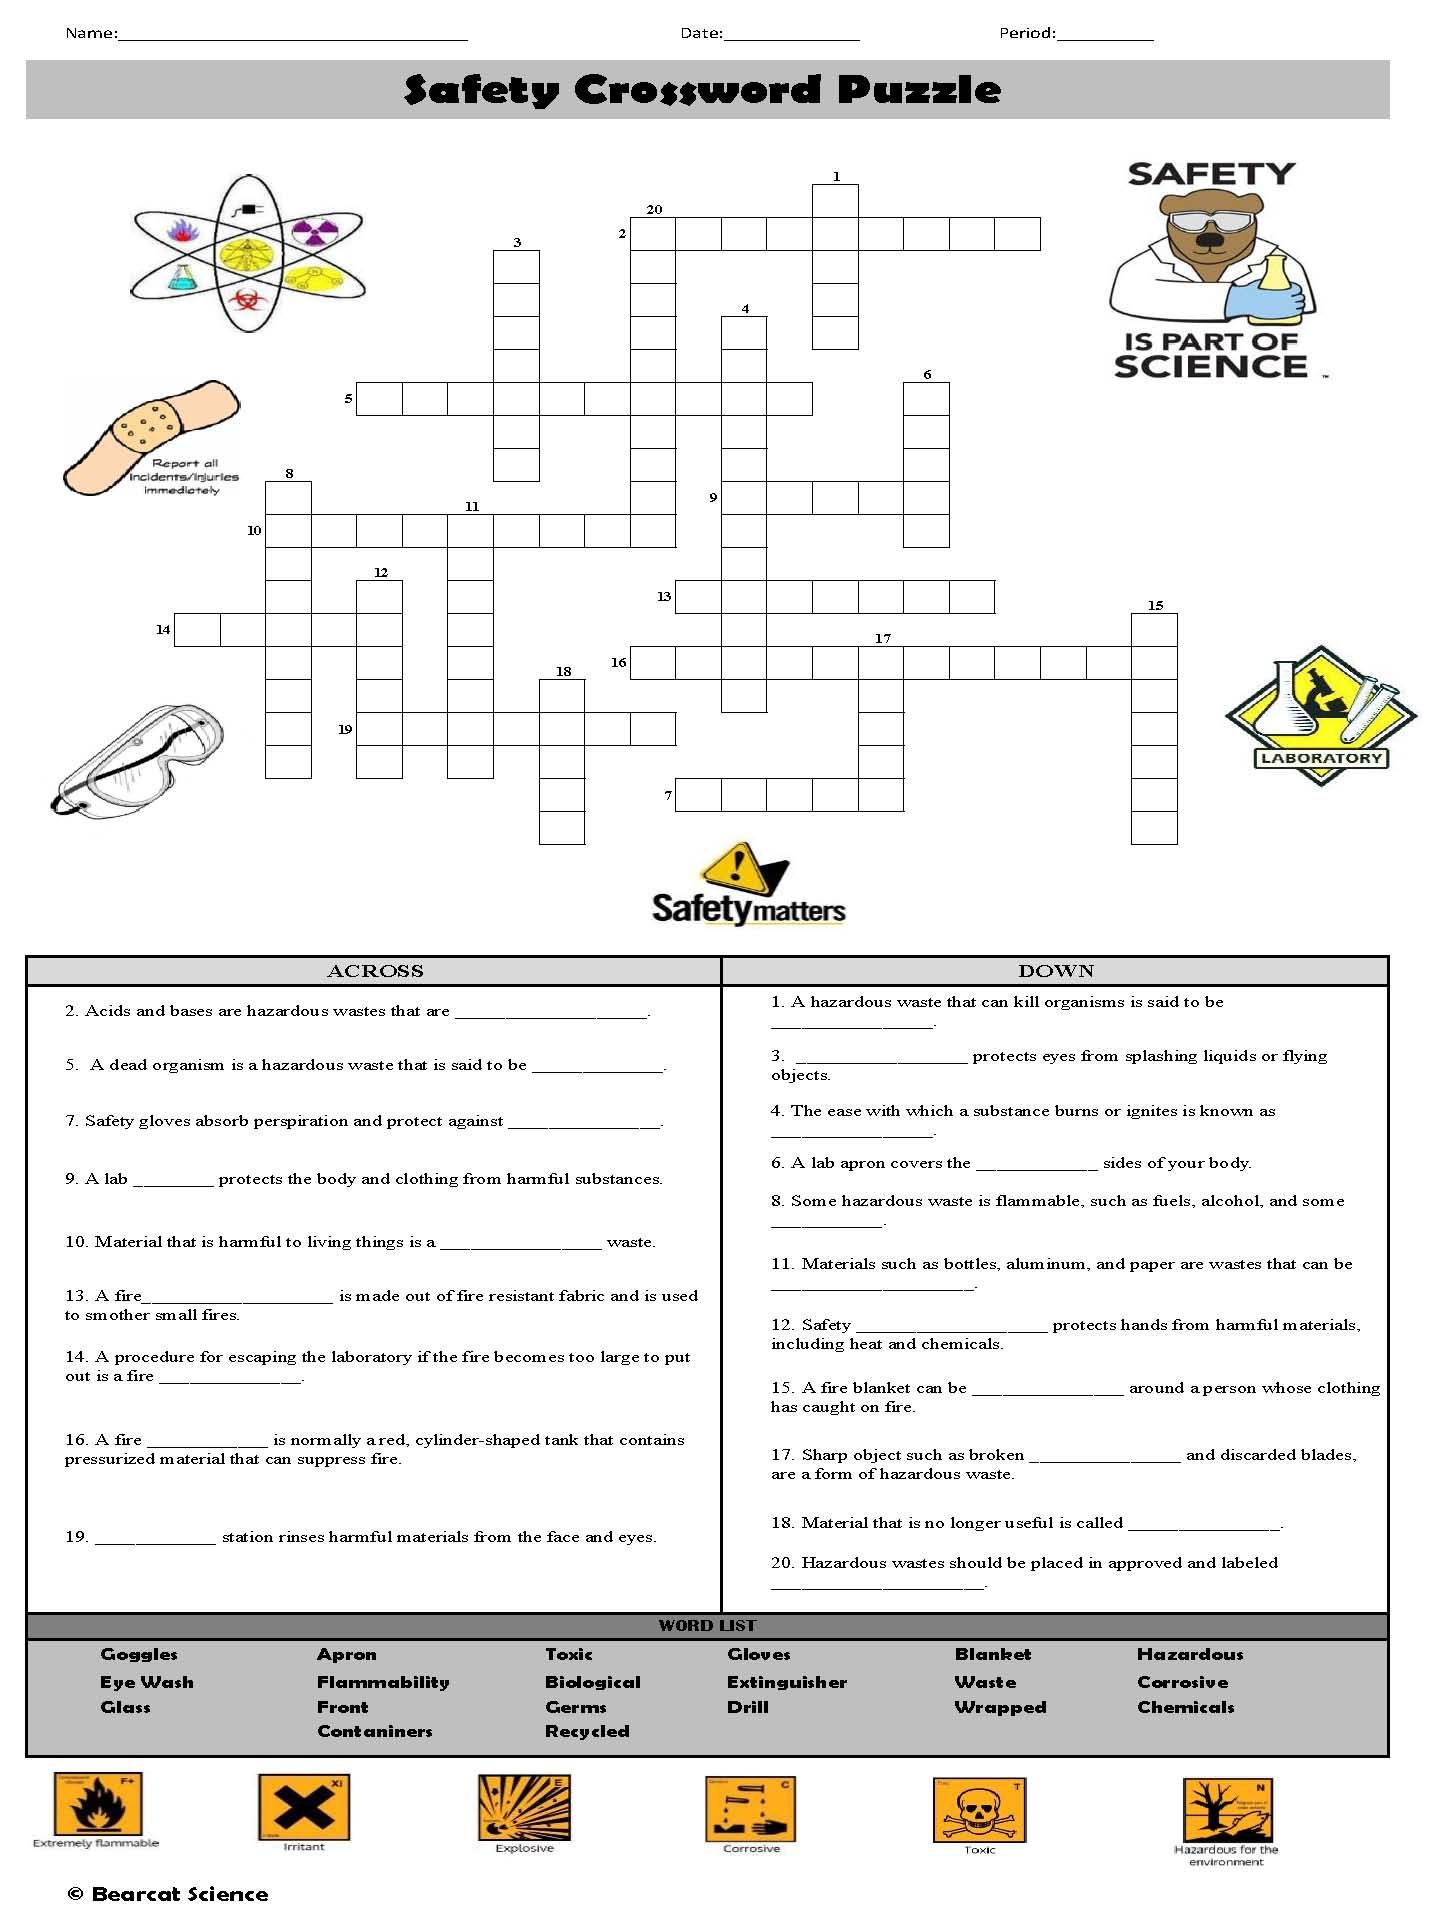 Safety Crossword Puzzle   Crossword [ 1920 x 1439 Pixel ]